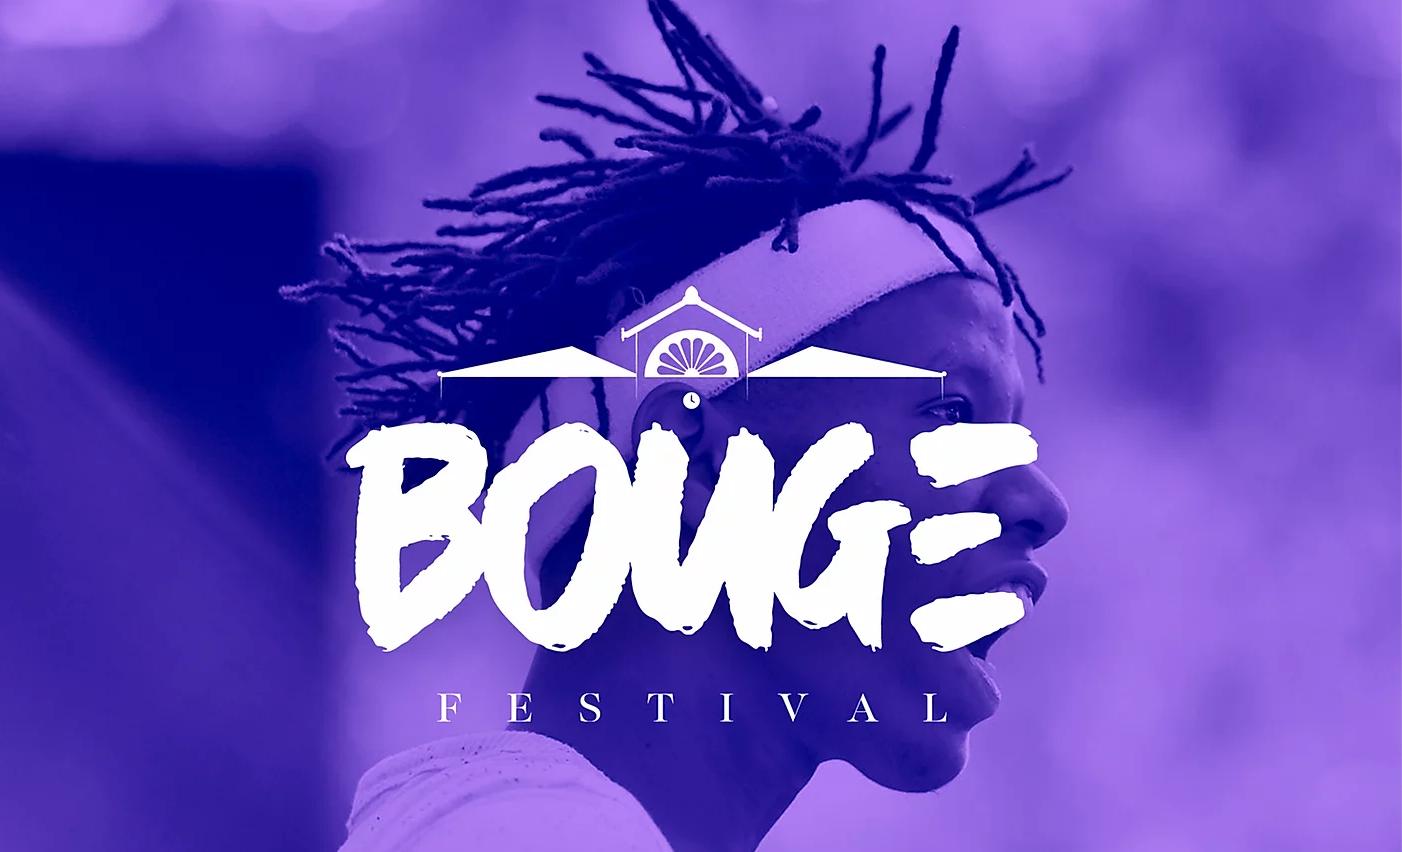 Festival Bouge